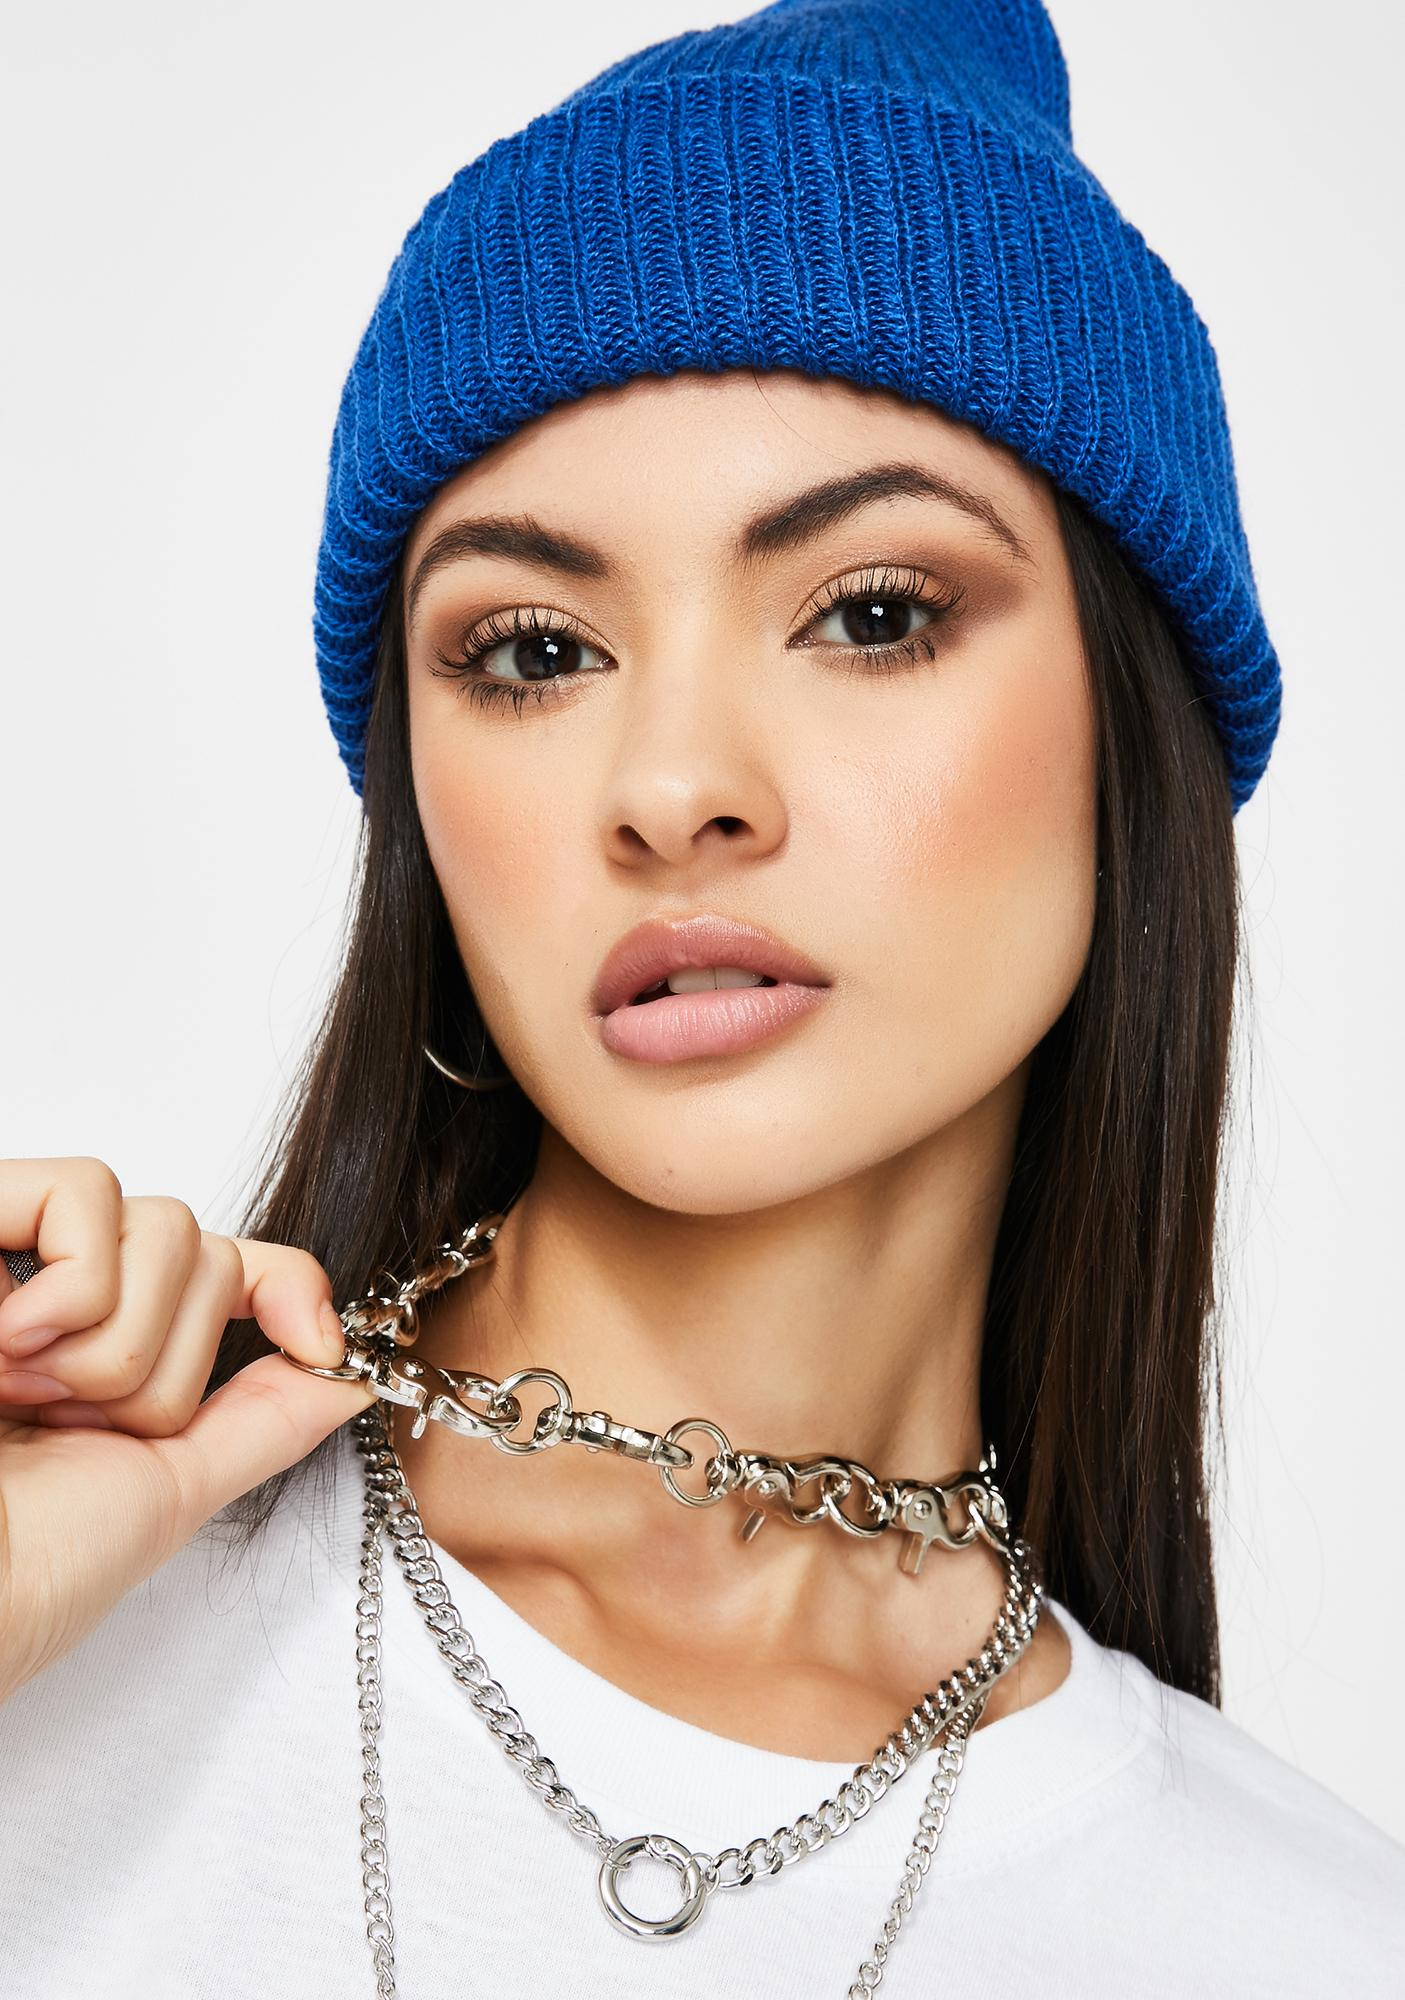 Forever Hooked Chain Choker